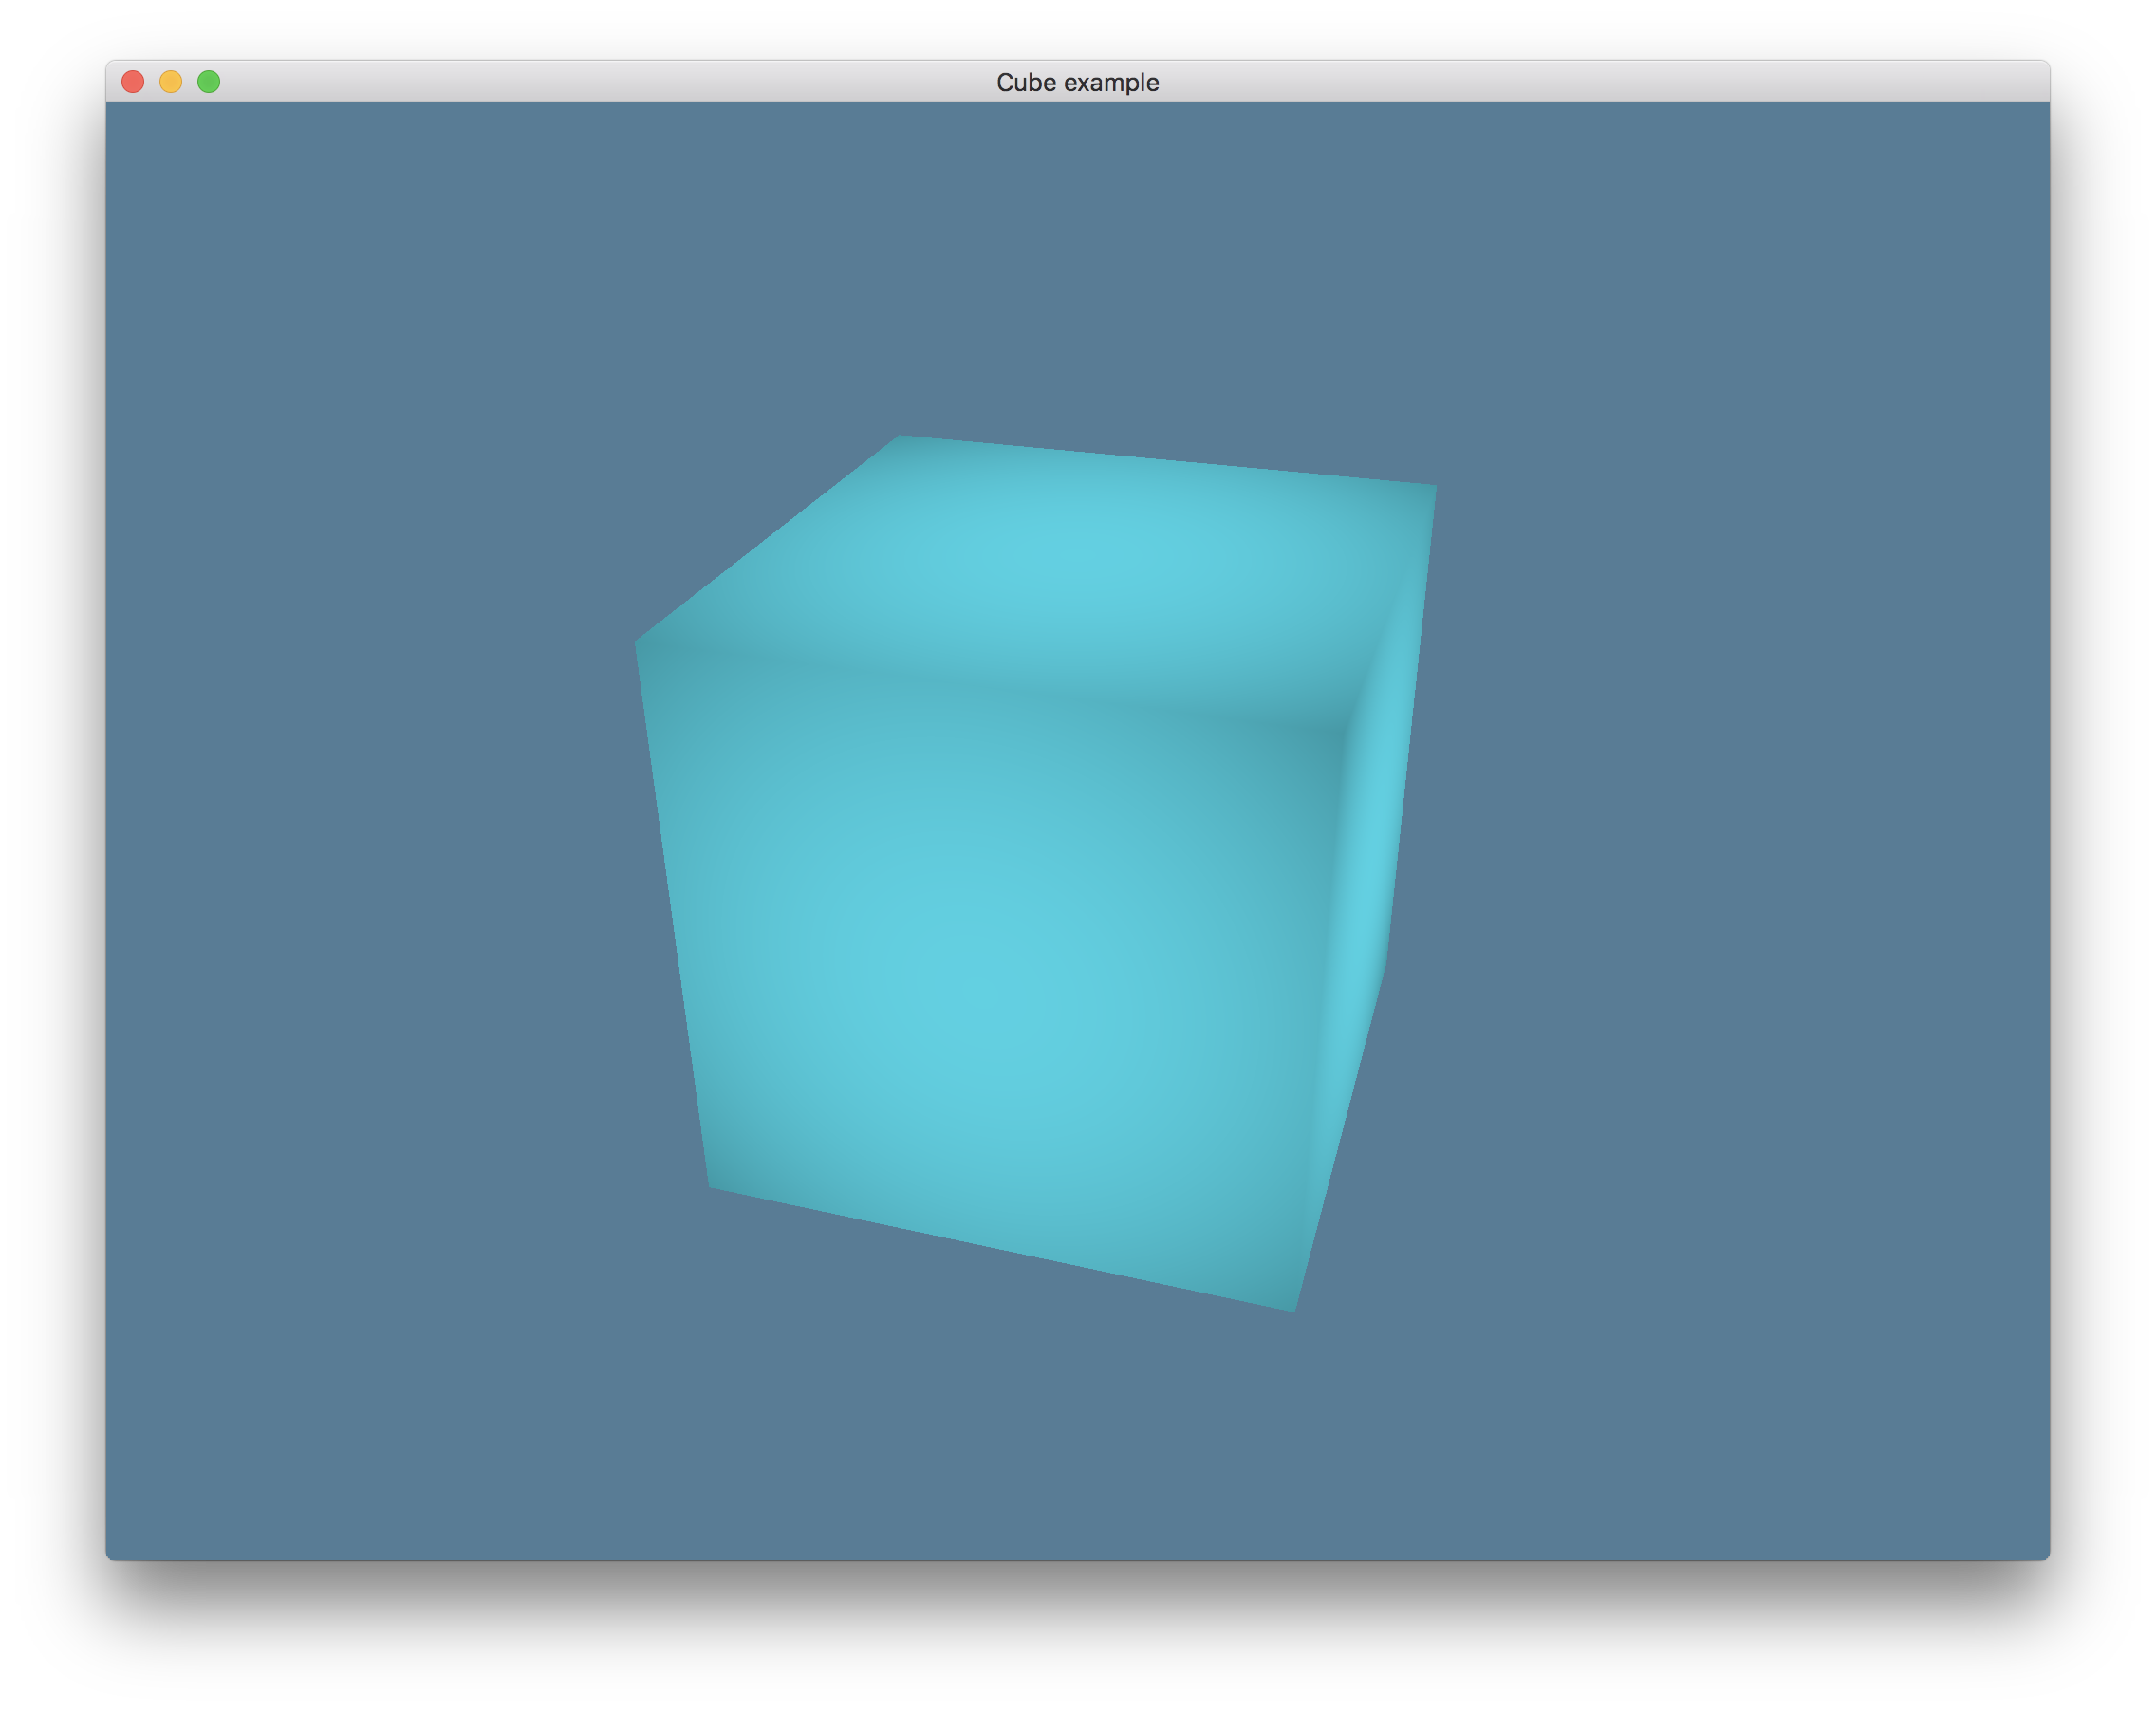 gfx_cube_example_opengl